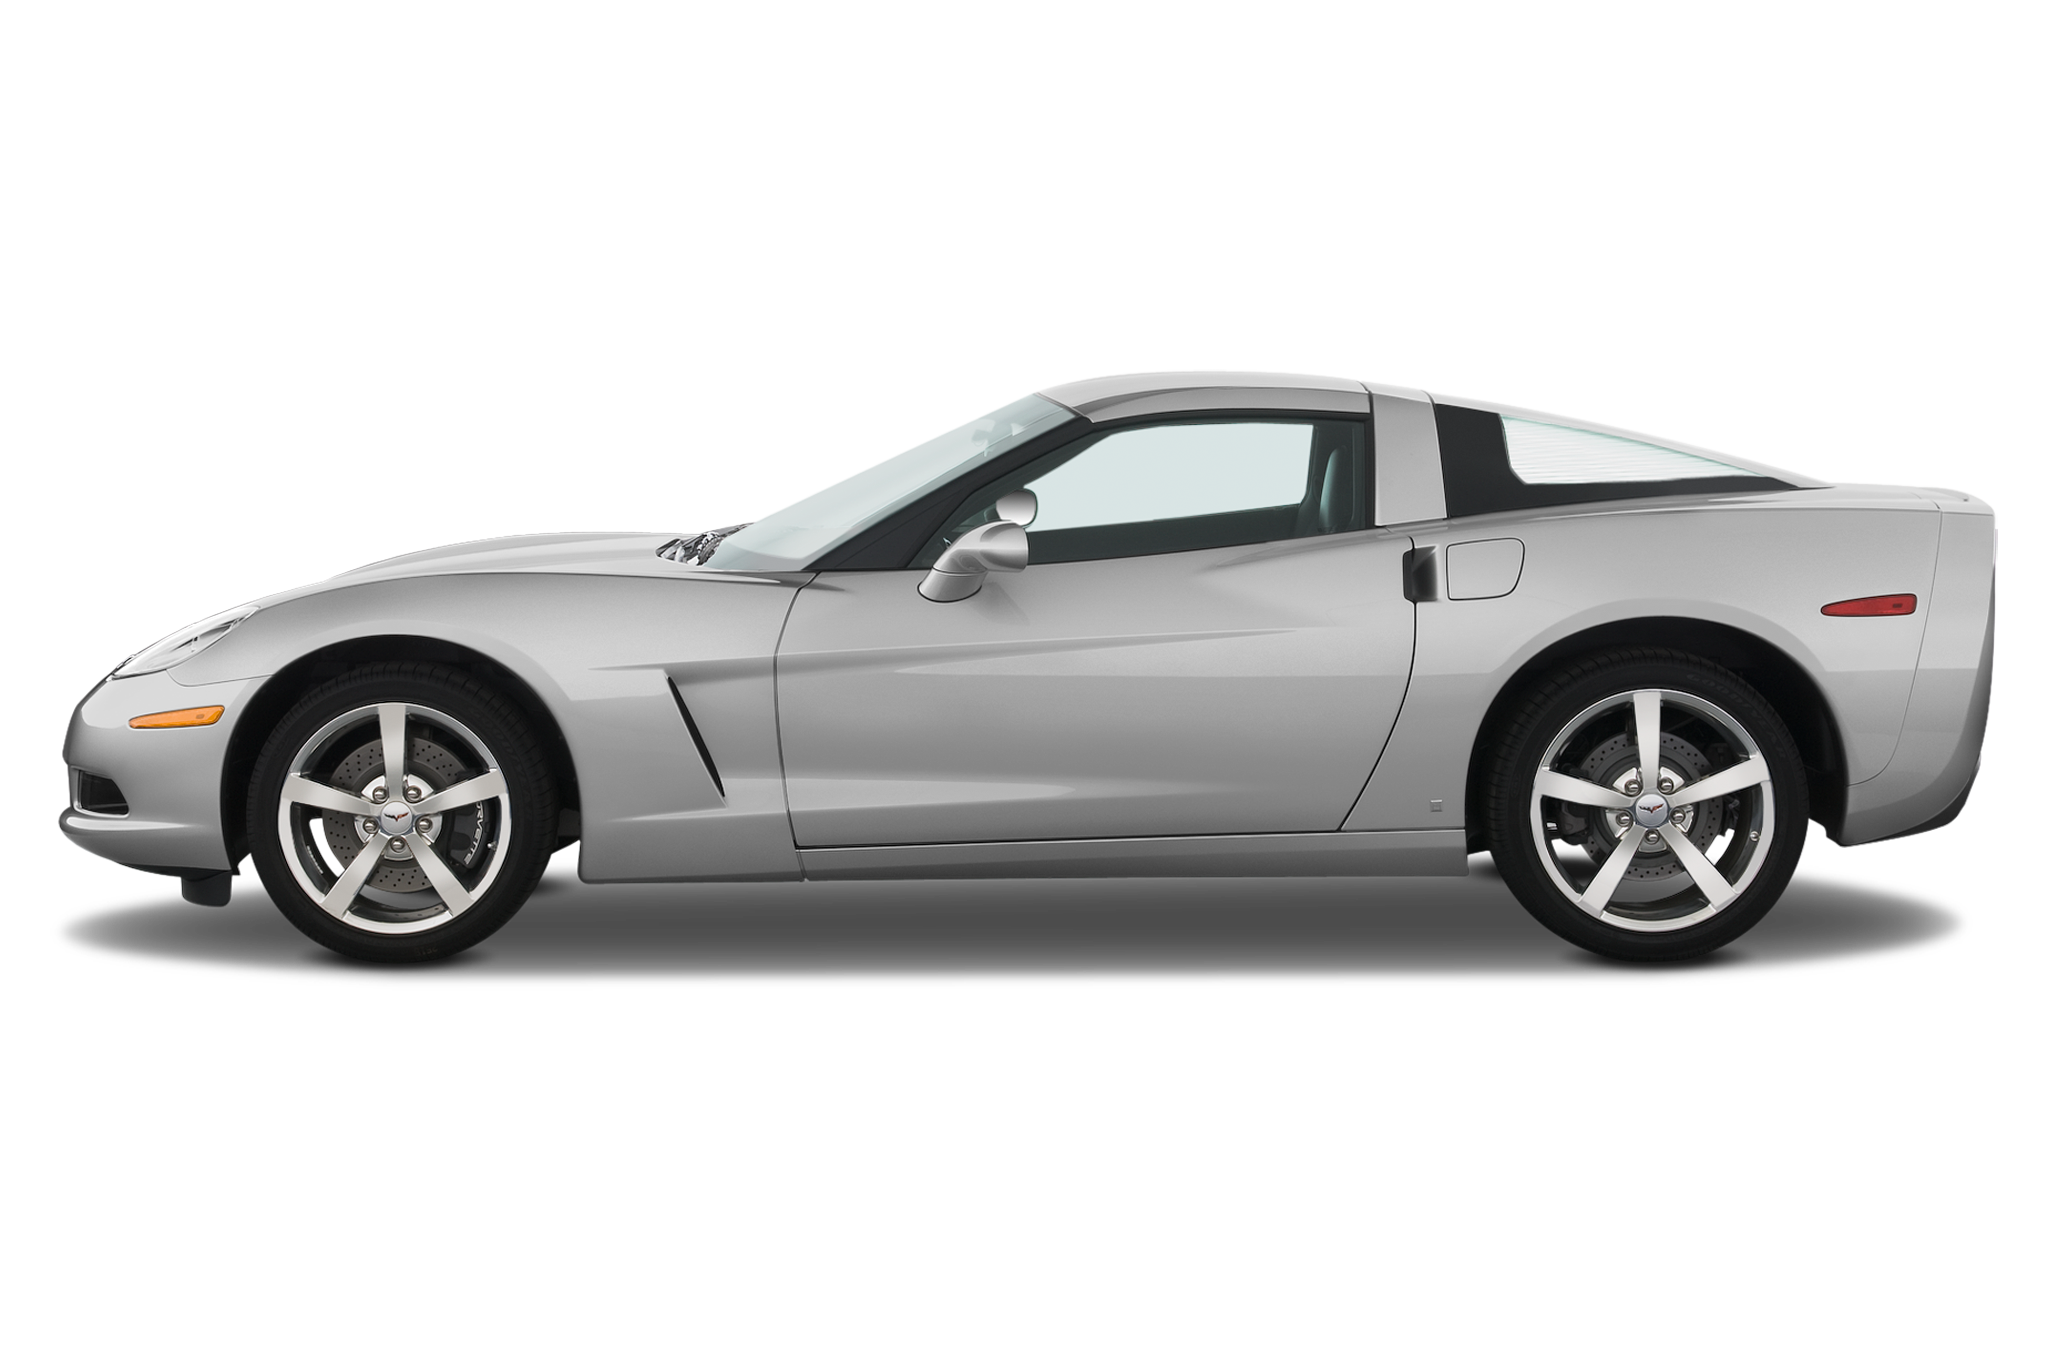 Chevrolet Corvette Image Pure Free Transparent Cc0 2000 Saturn Ls Fuse Diagram Library